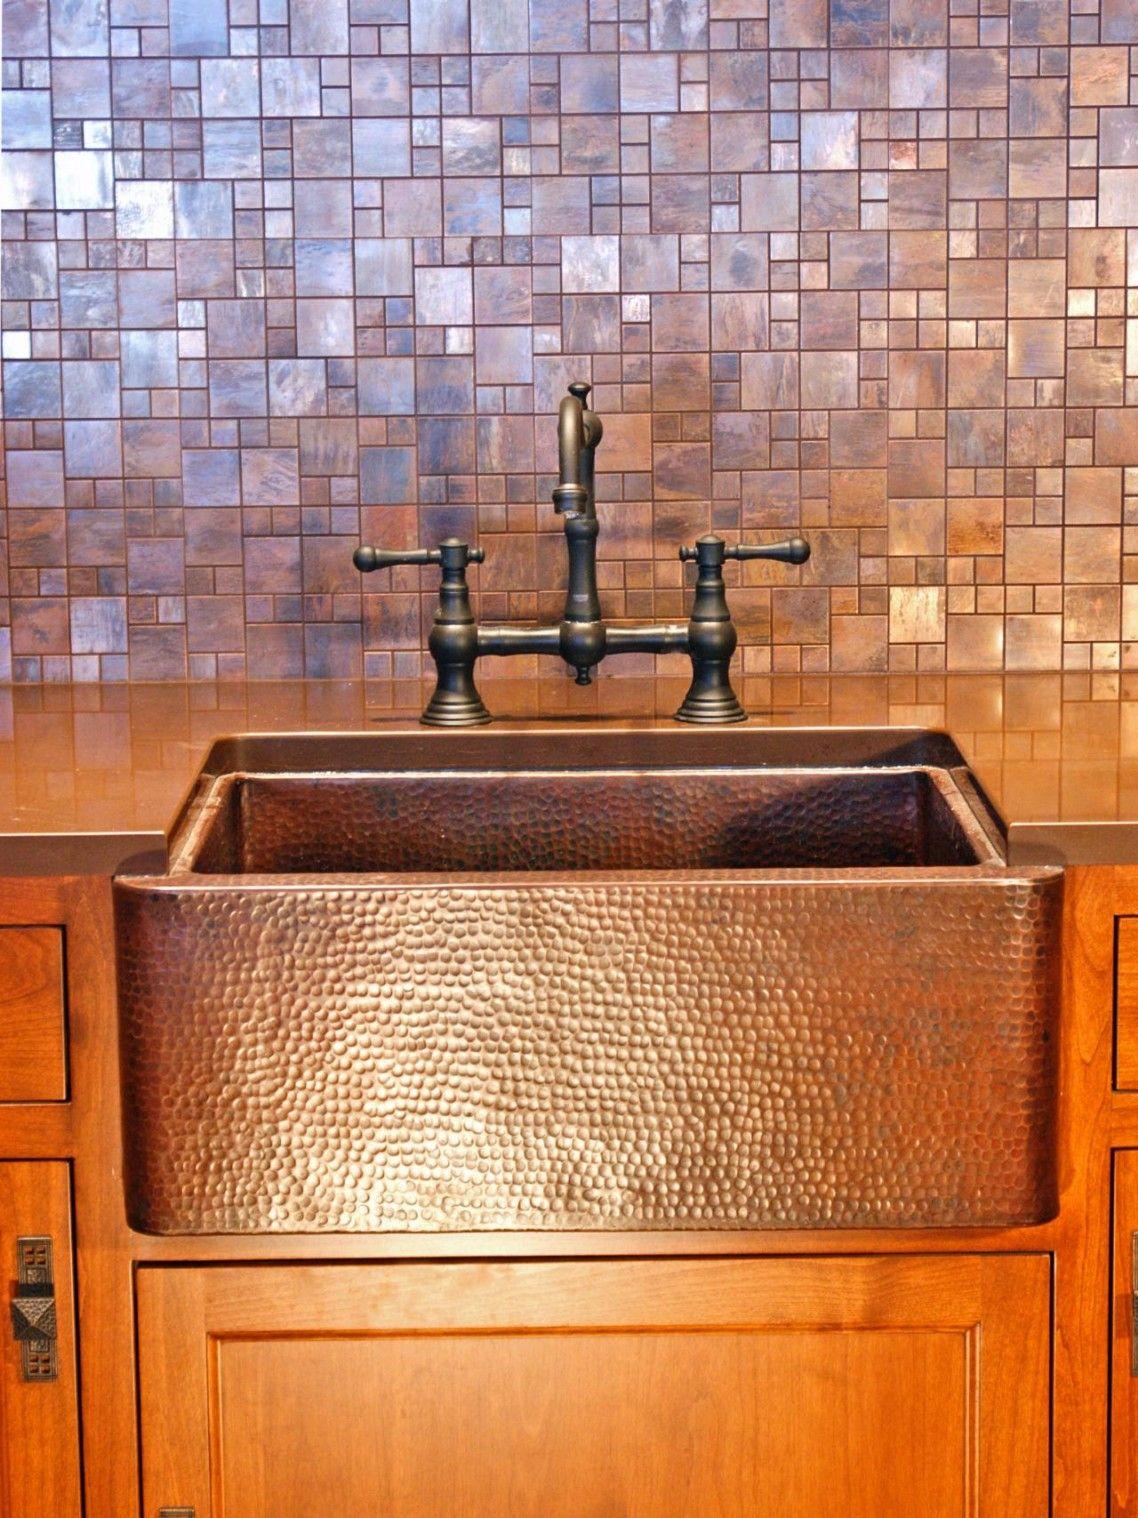 - Decor & Tips: Copper Farmhouse Sink And Bridge Faucet With Copper